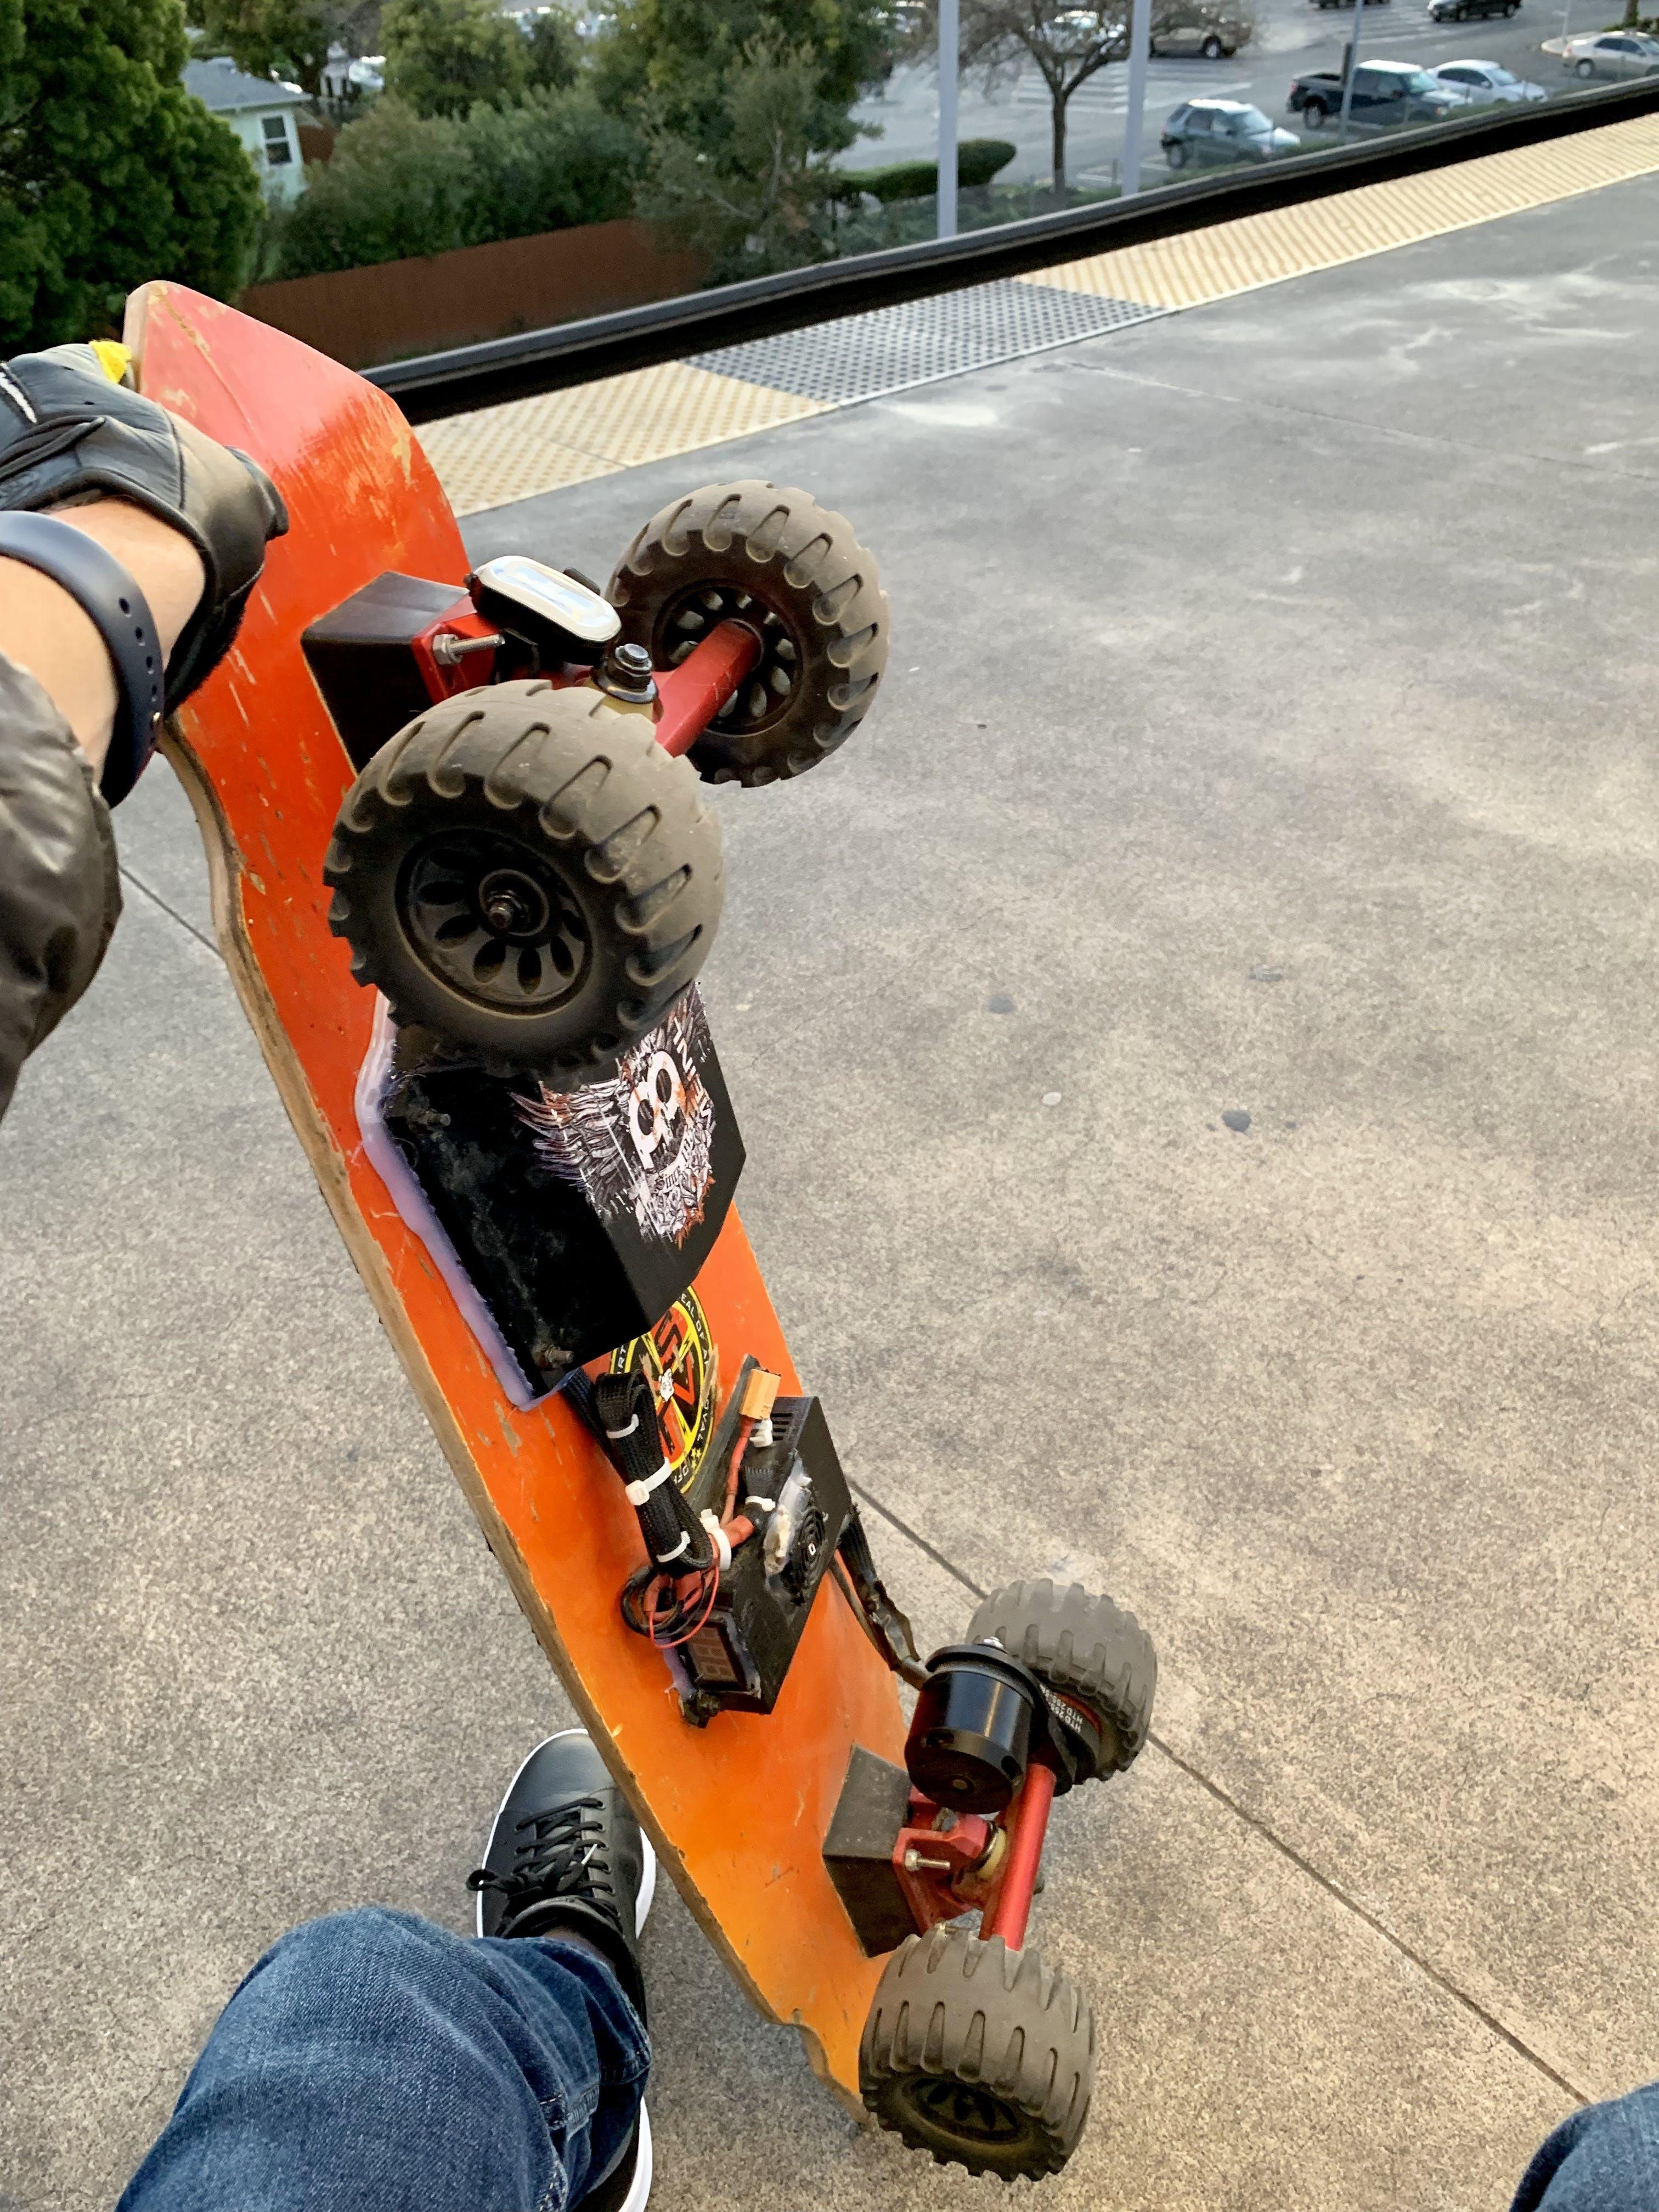 My DIY electric skateboard, 24V, before NeoPixel modification